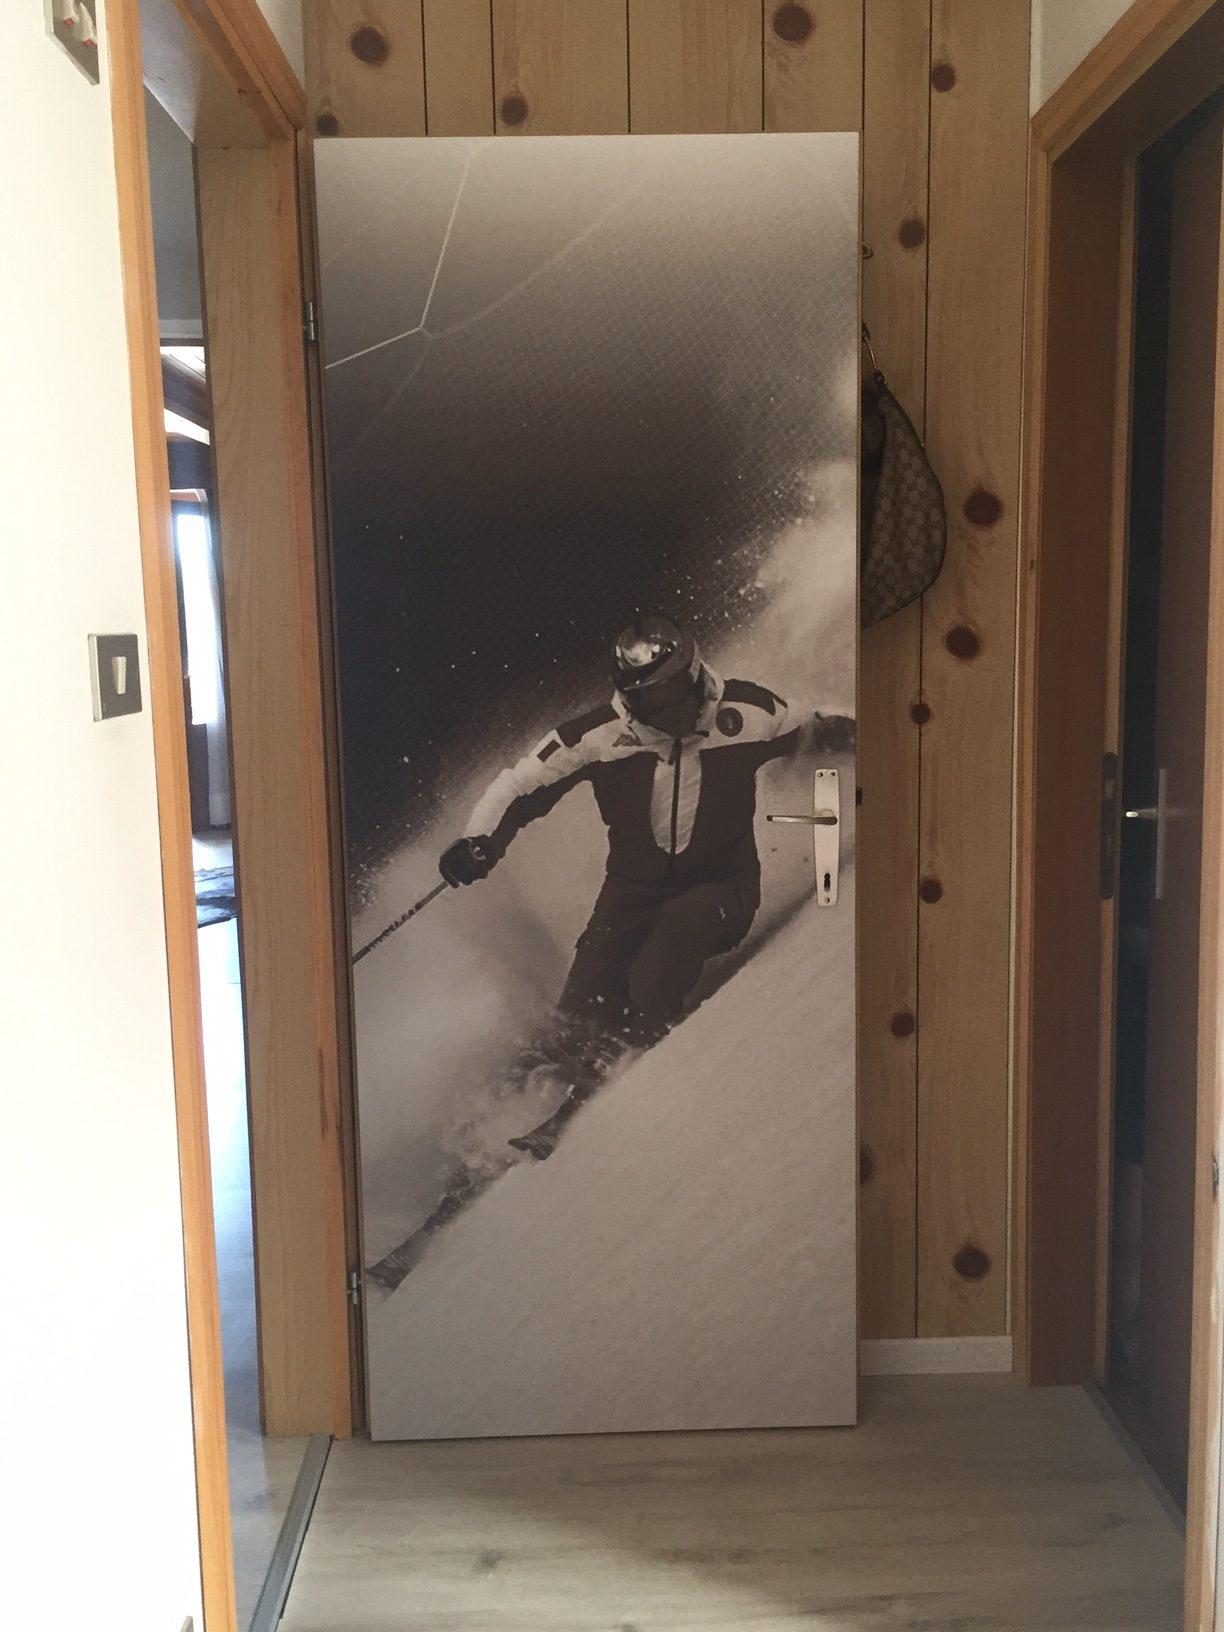 Allestimento con adesivo ed adesivo sabbiato – Alpen Life Hotel Someda, Moena